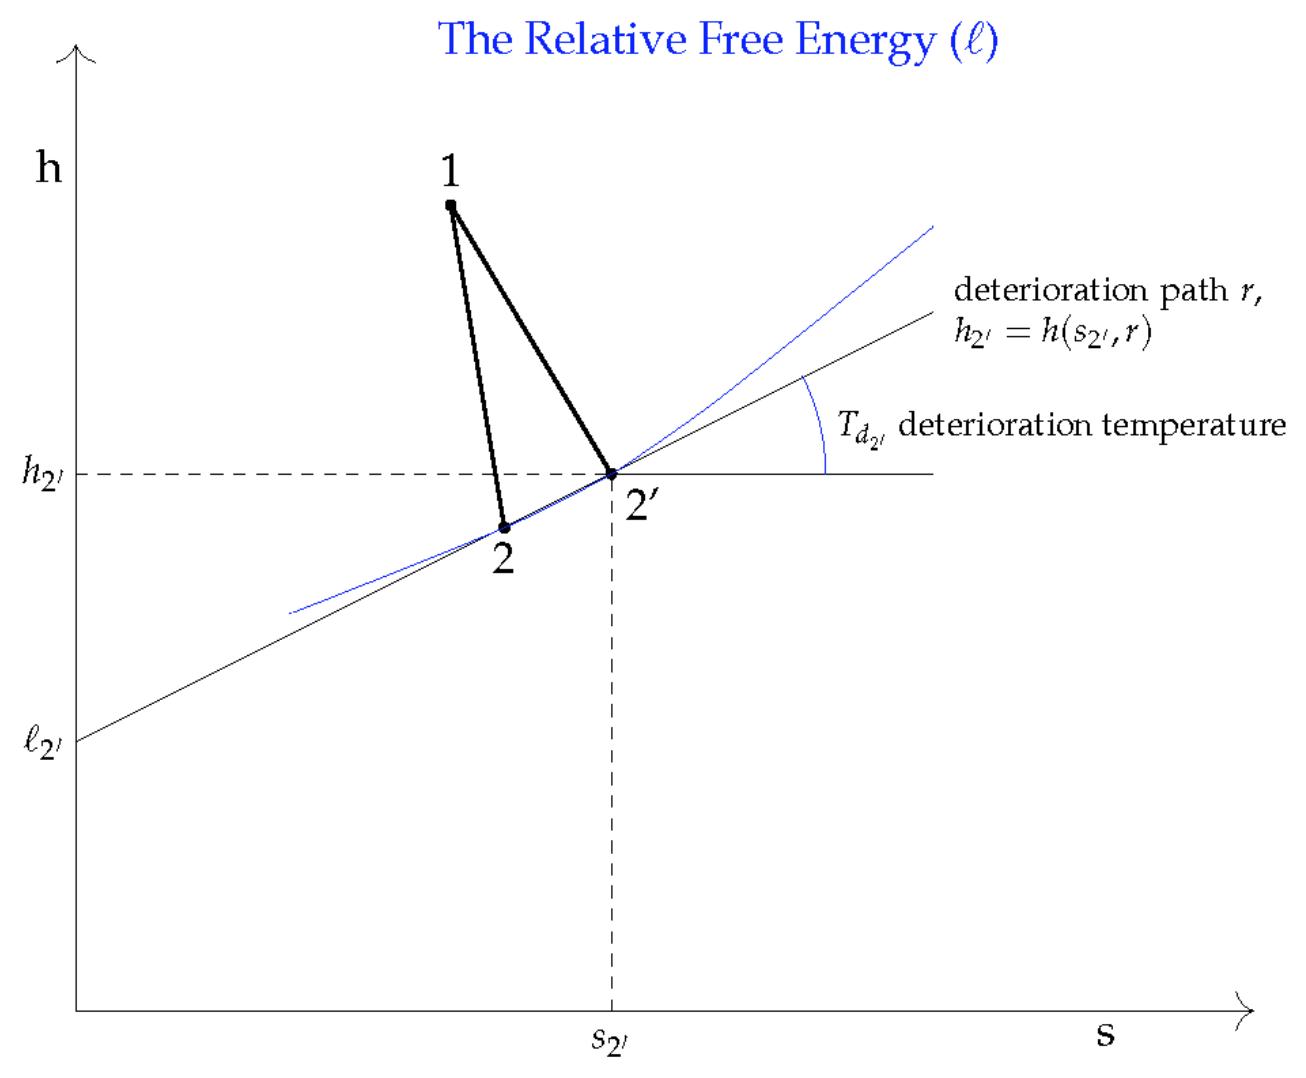 Relative Free Energy Function